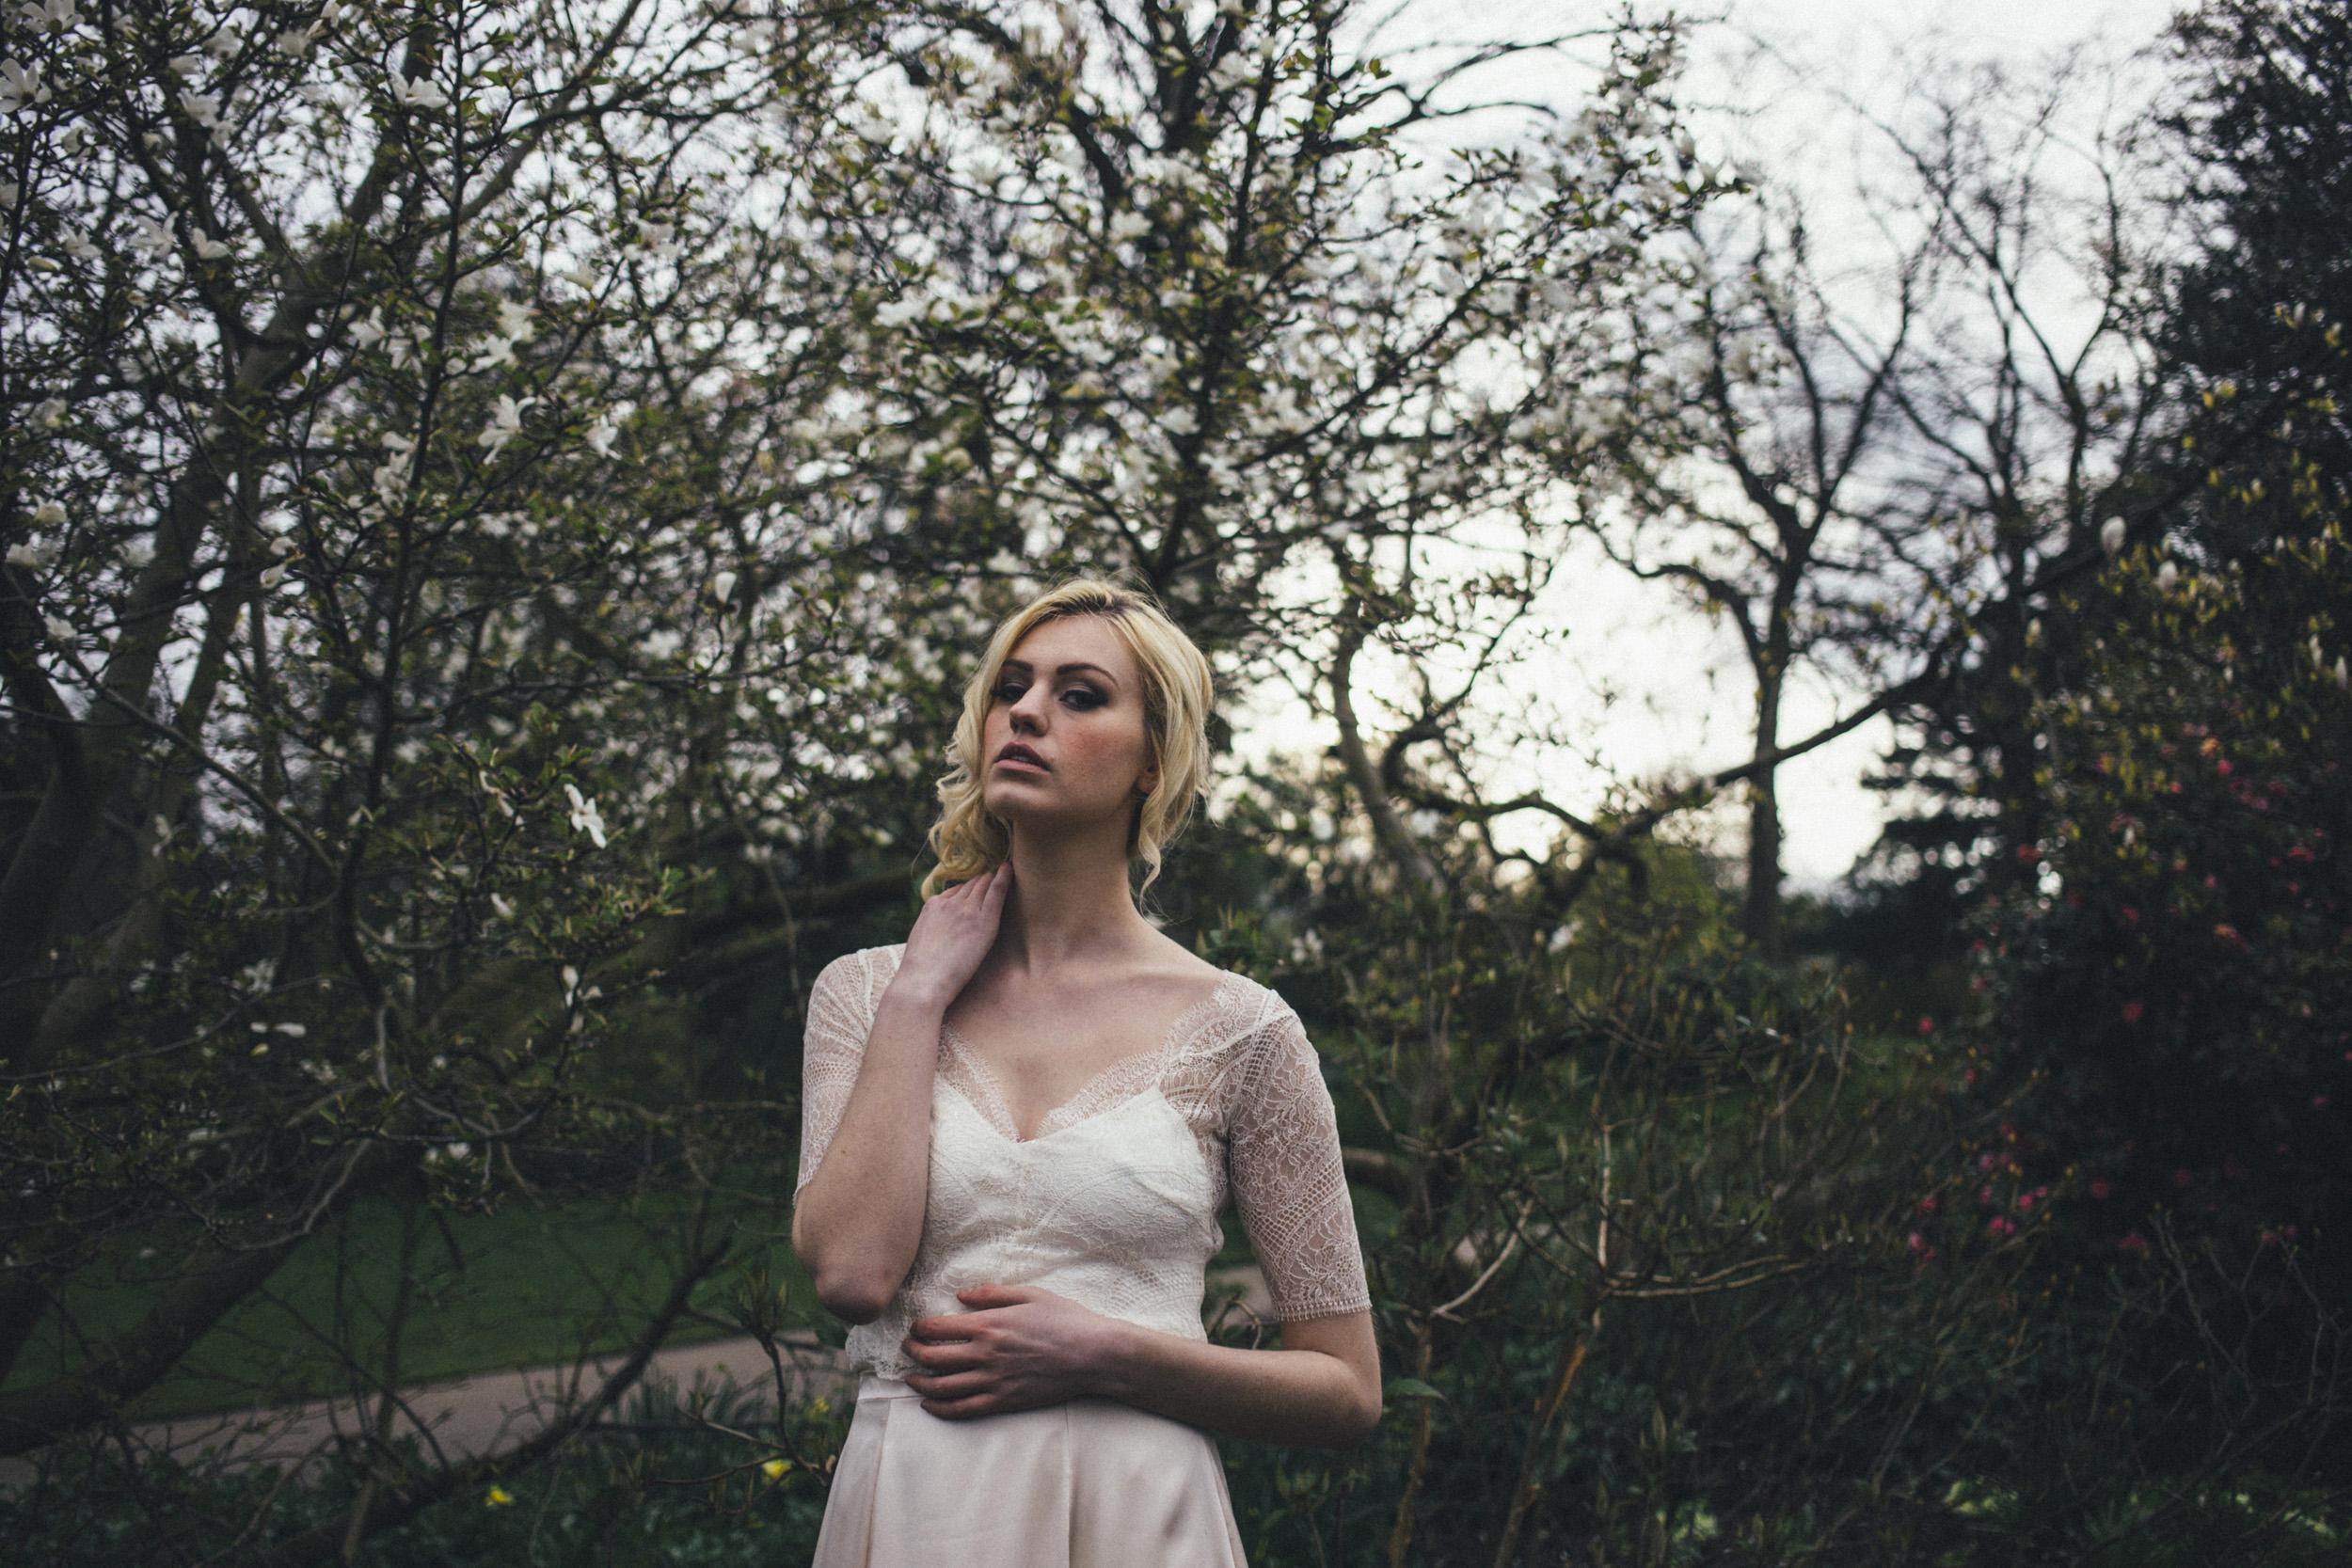 Spring-Bridal-Kate-Beaumont-Shelley-Richmond-Vintage-Wedding-Dress-12.jpg